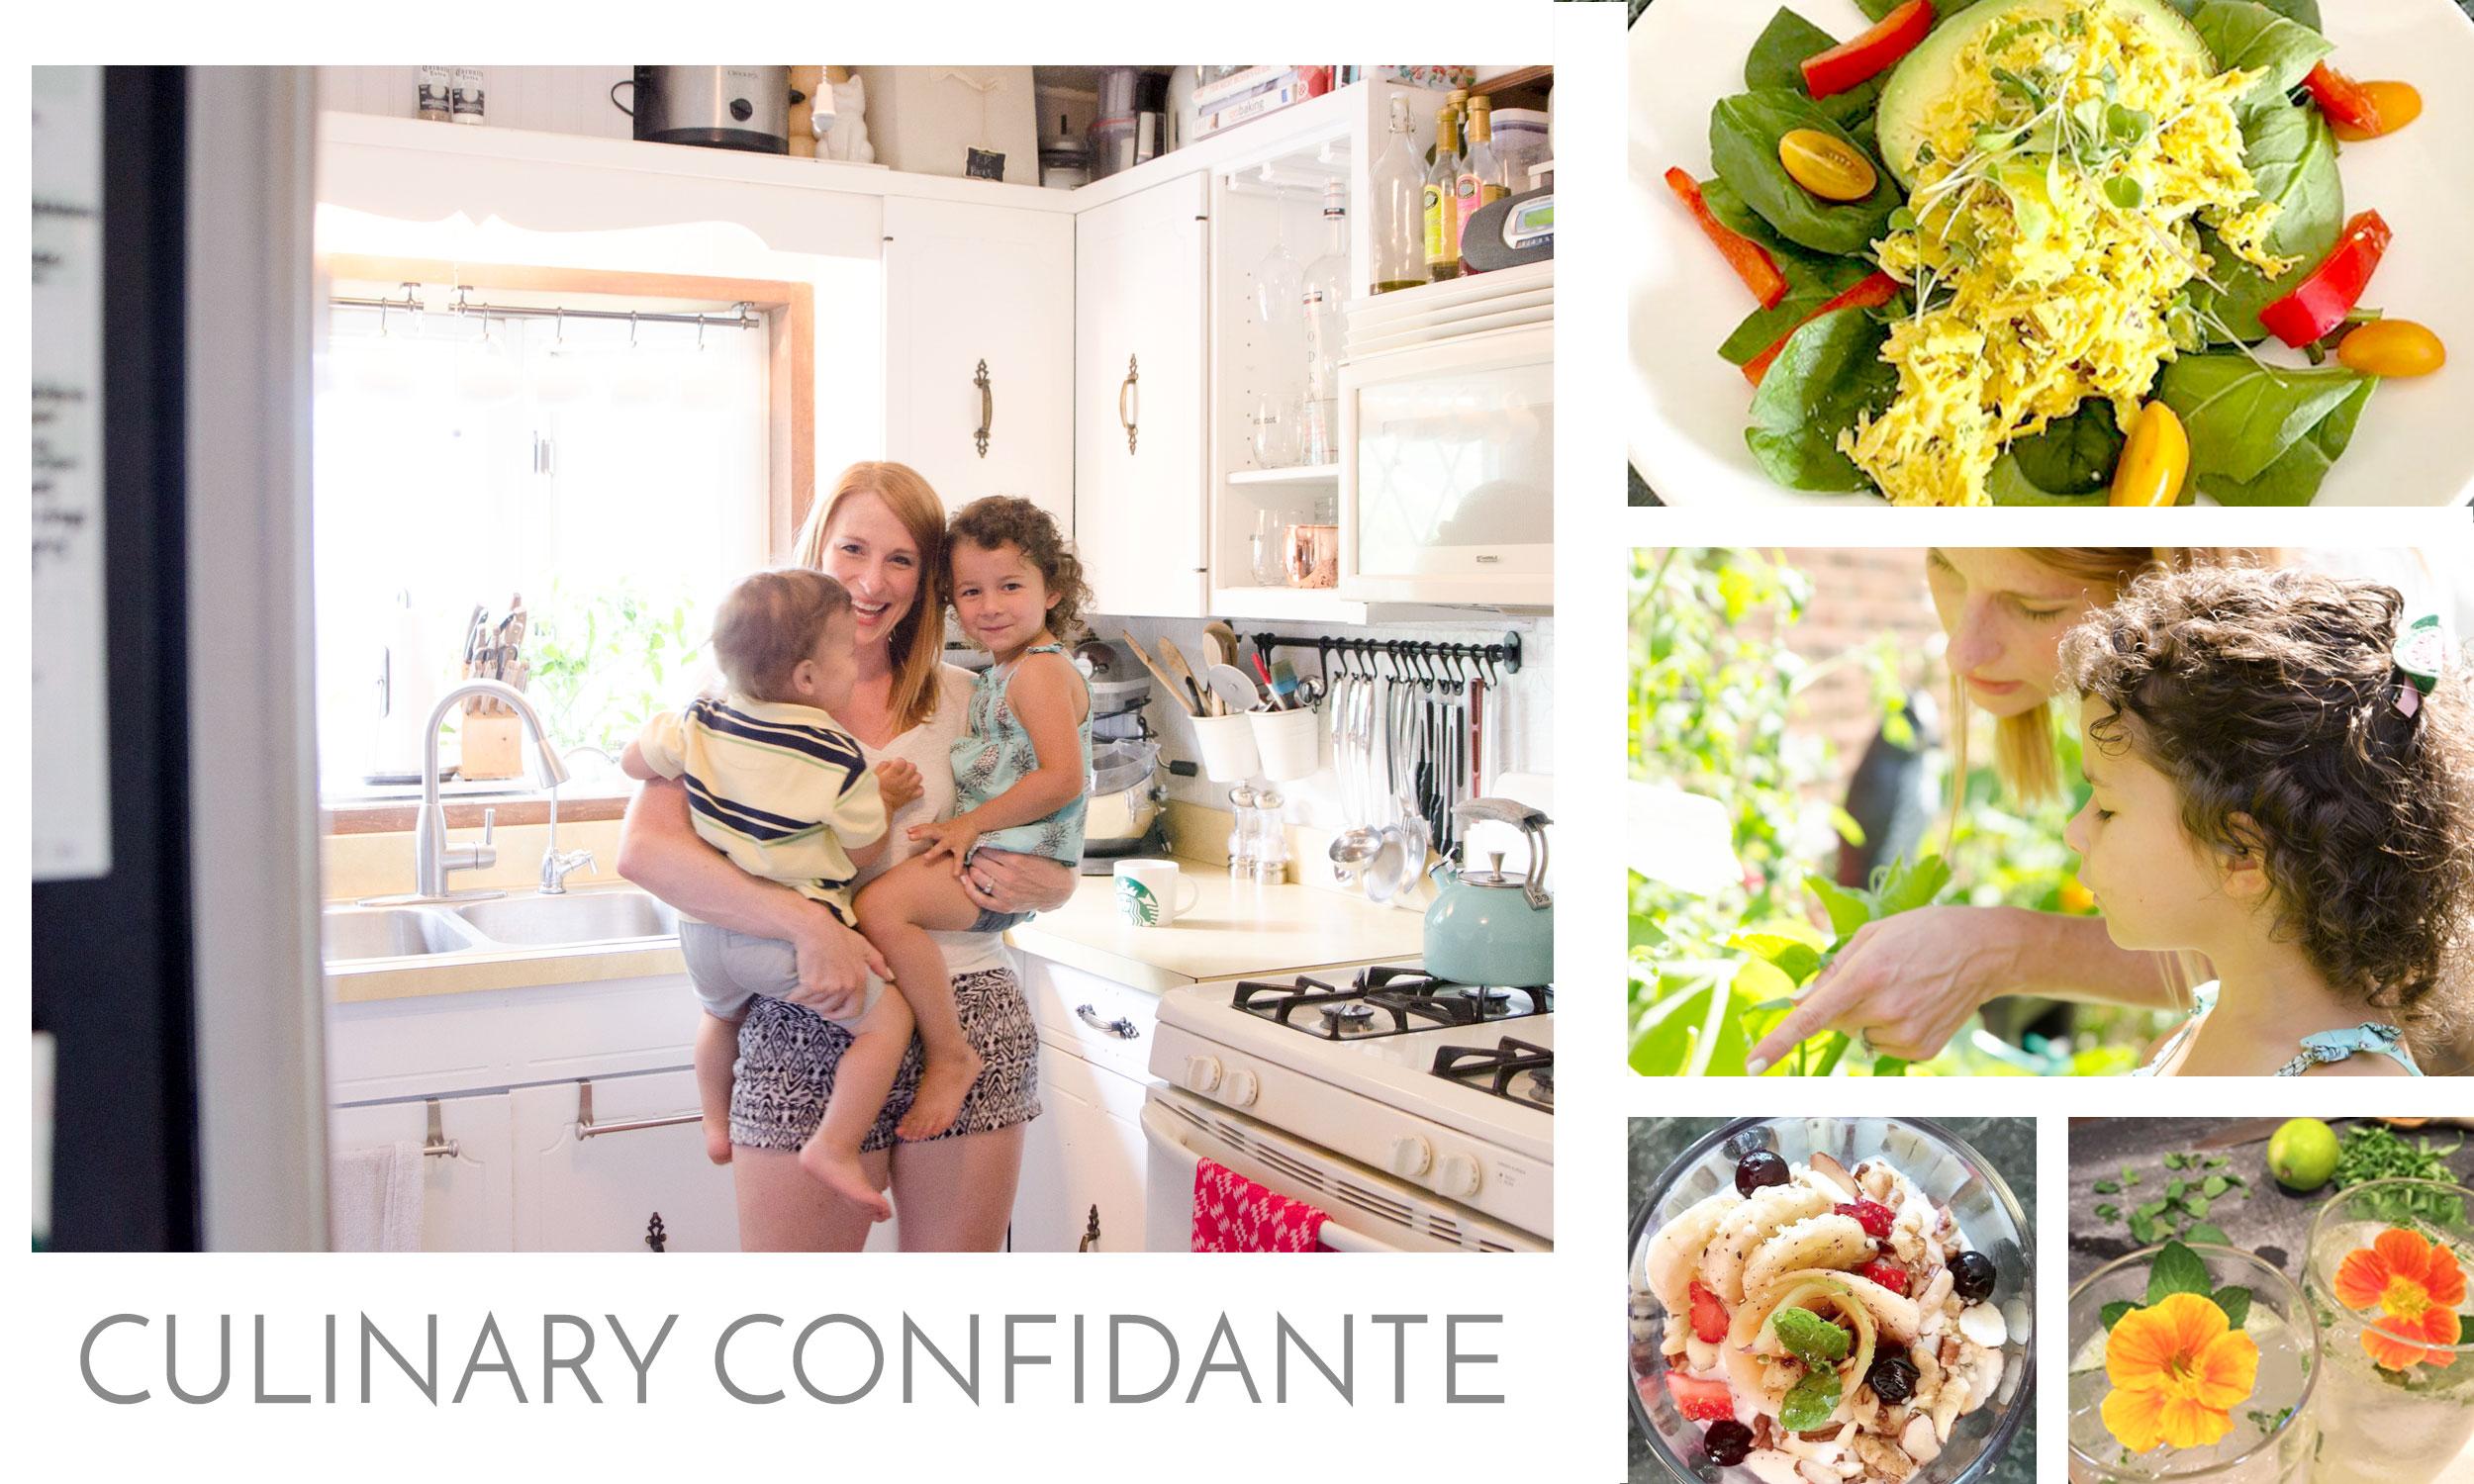 culinary confidante